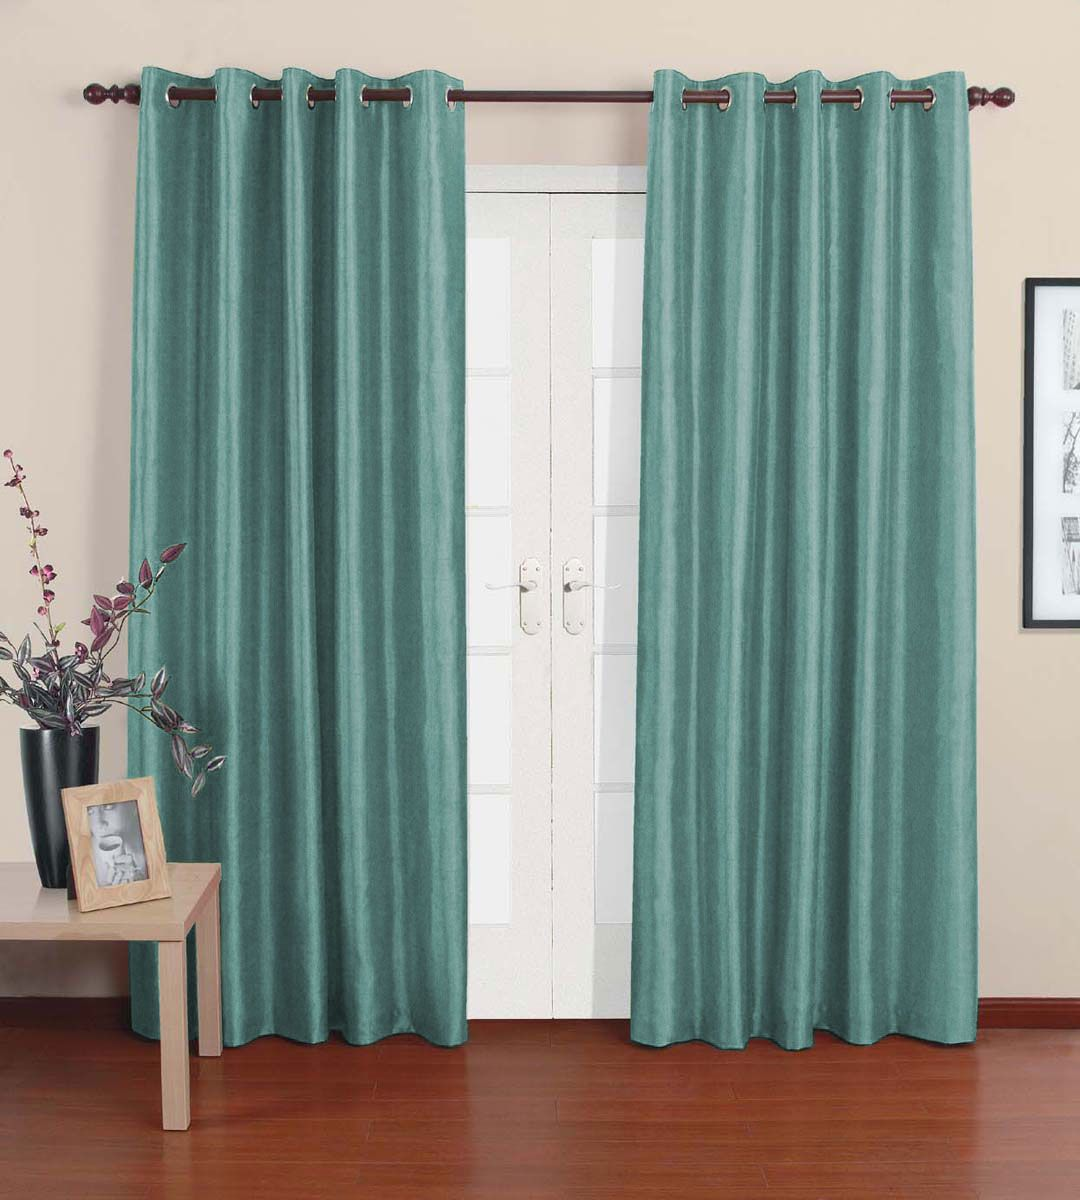 Aqua Curtains Aqua Curtains Dark Blue Curtains Blue Curtains